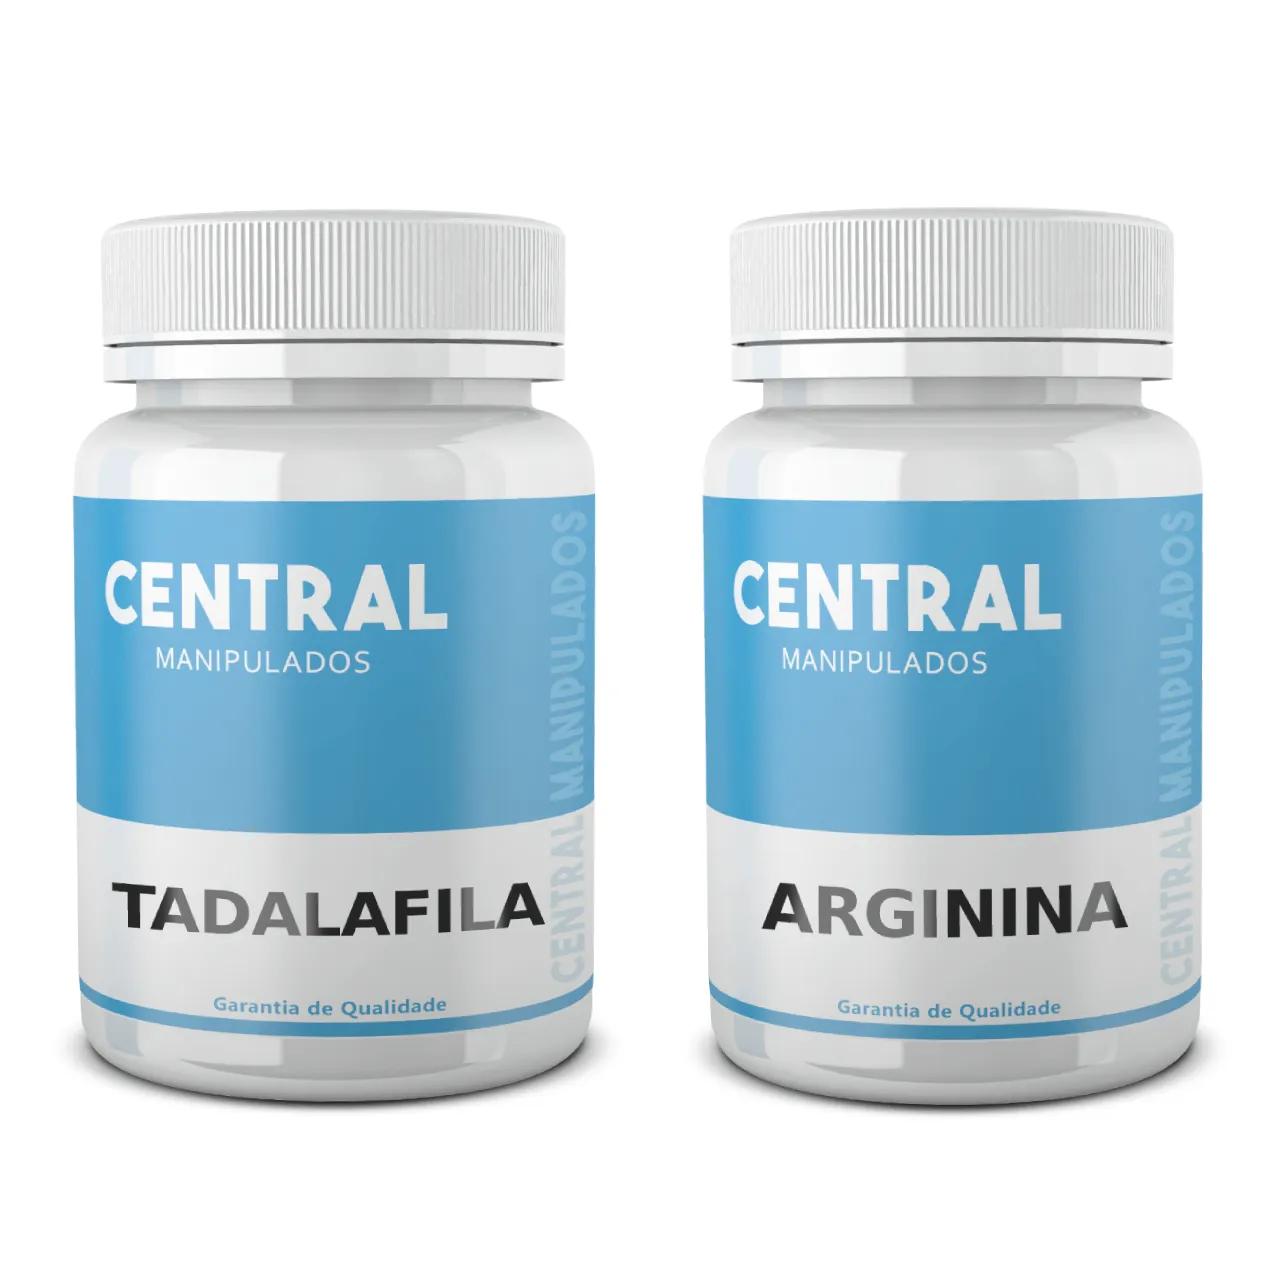 Tadalafila 20mg 60 Cápsulas + Arginina 500mg 60 Cápsulas - Vasodilatador